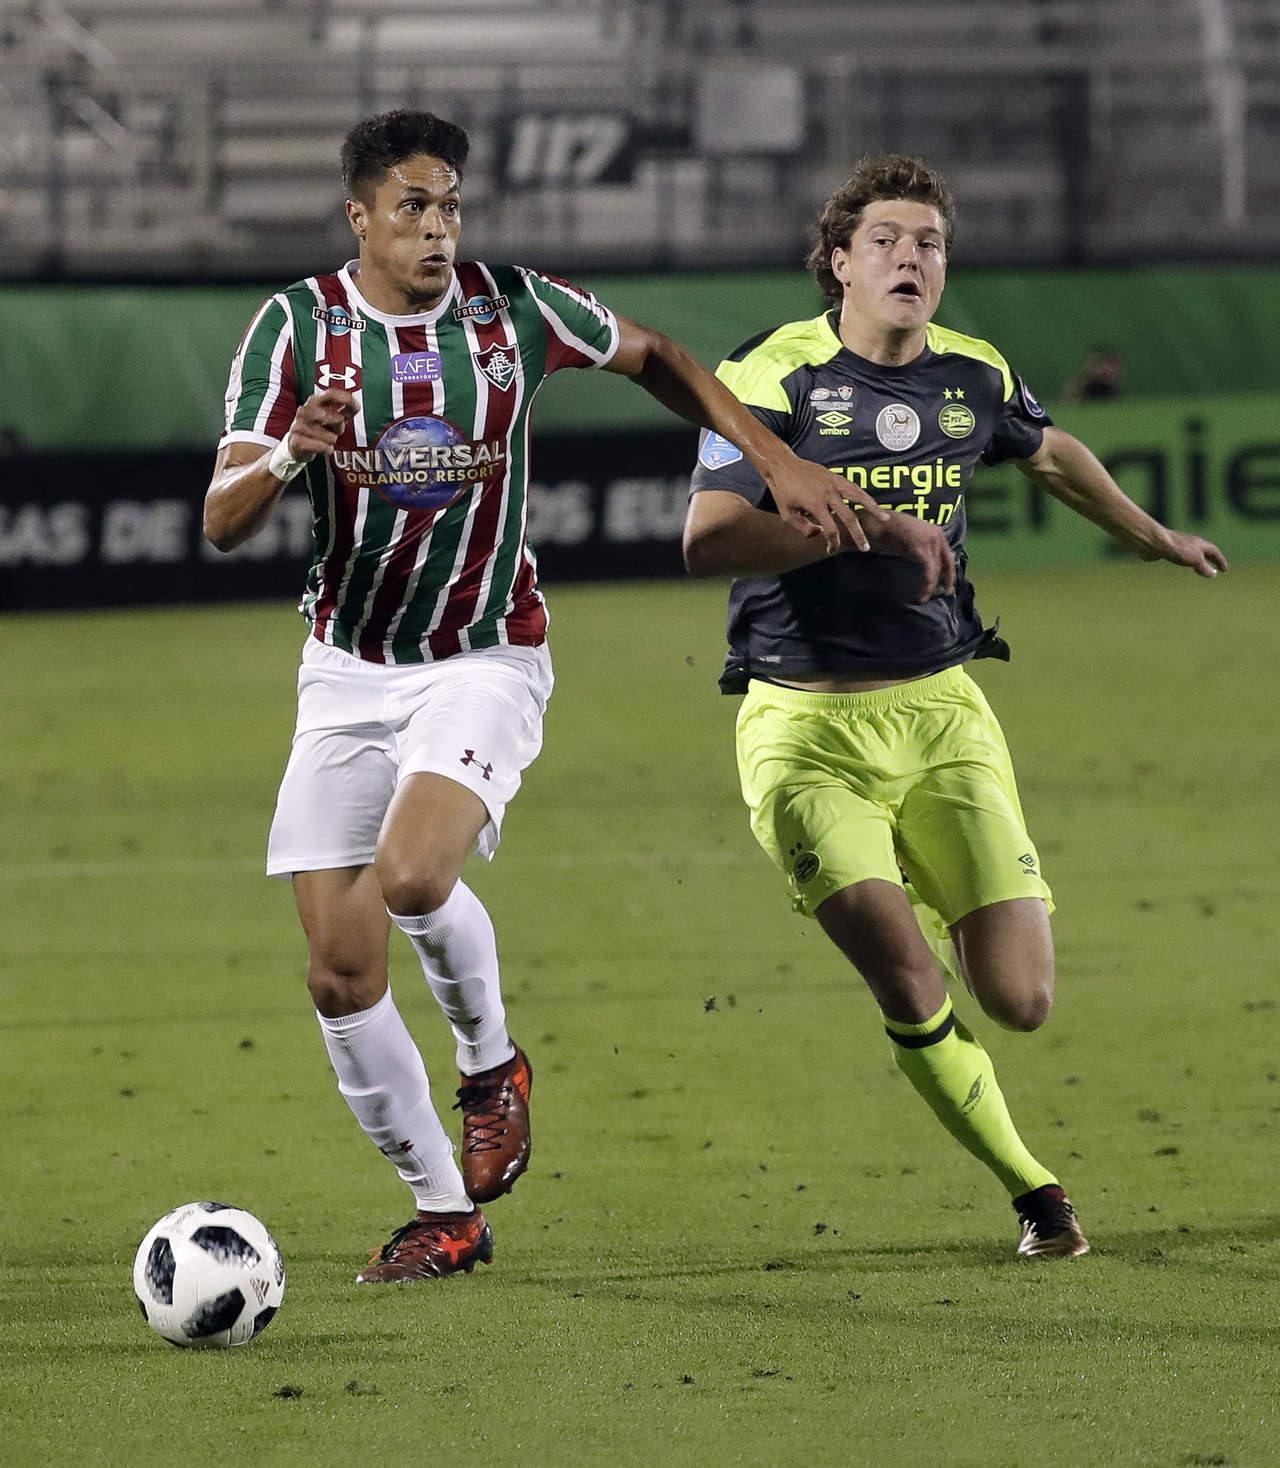 PSV vence en penales a Fluminense con gol del Lozano